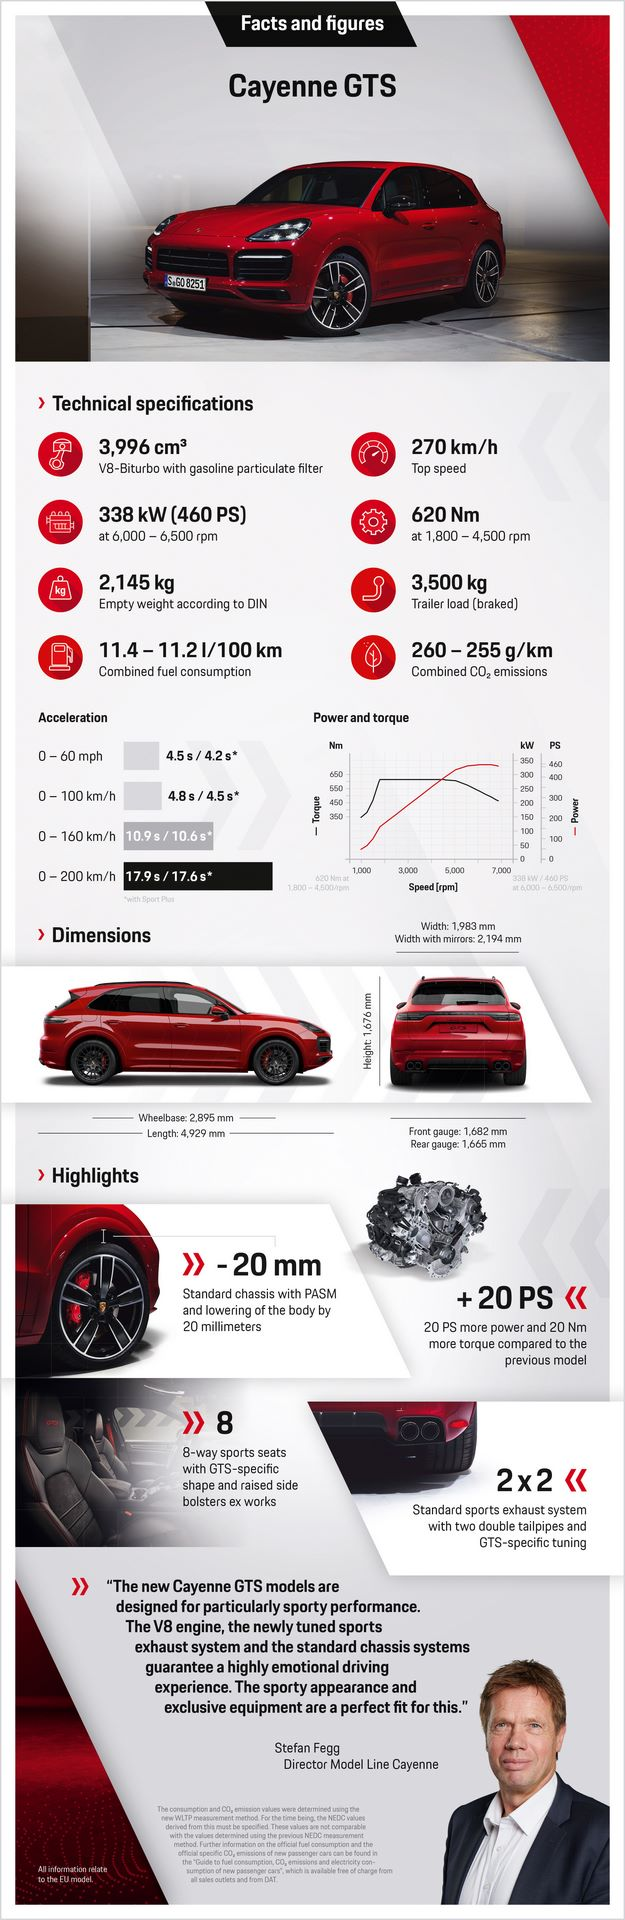 2020.06.03_PORSCHE_Infografik_Cayenne_GTS_EN_v3.indd